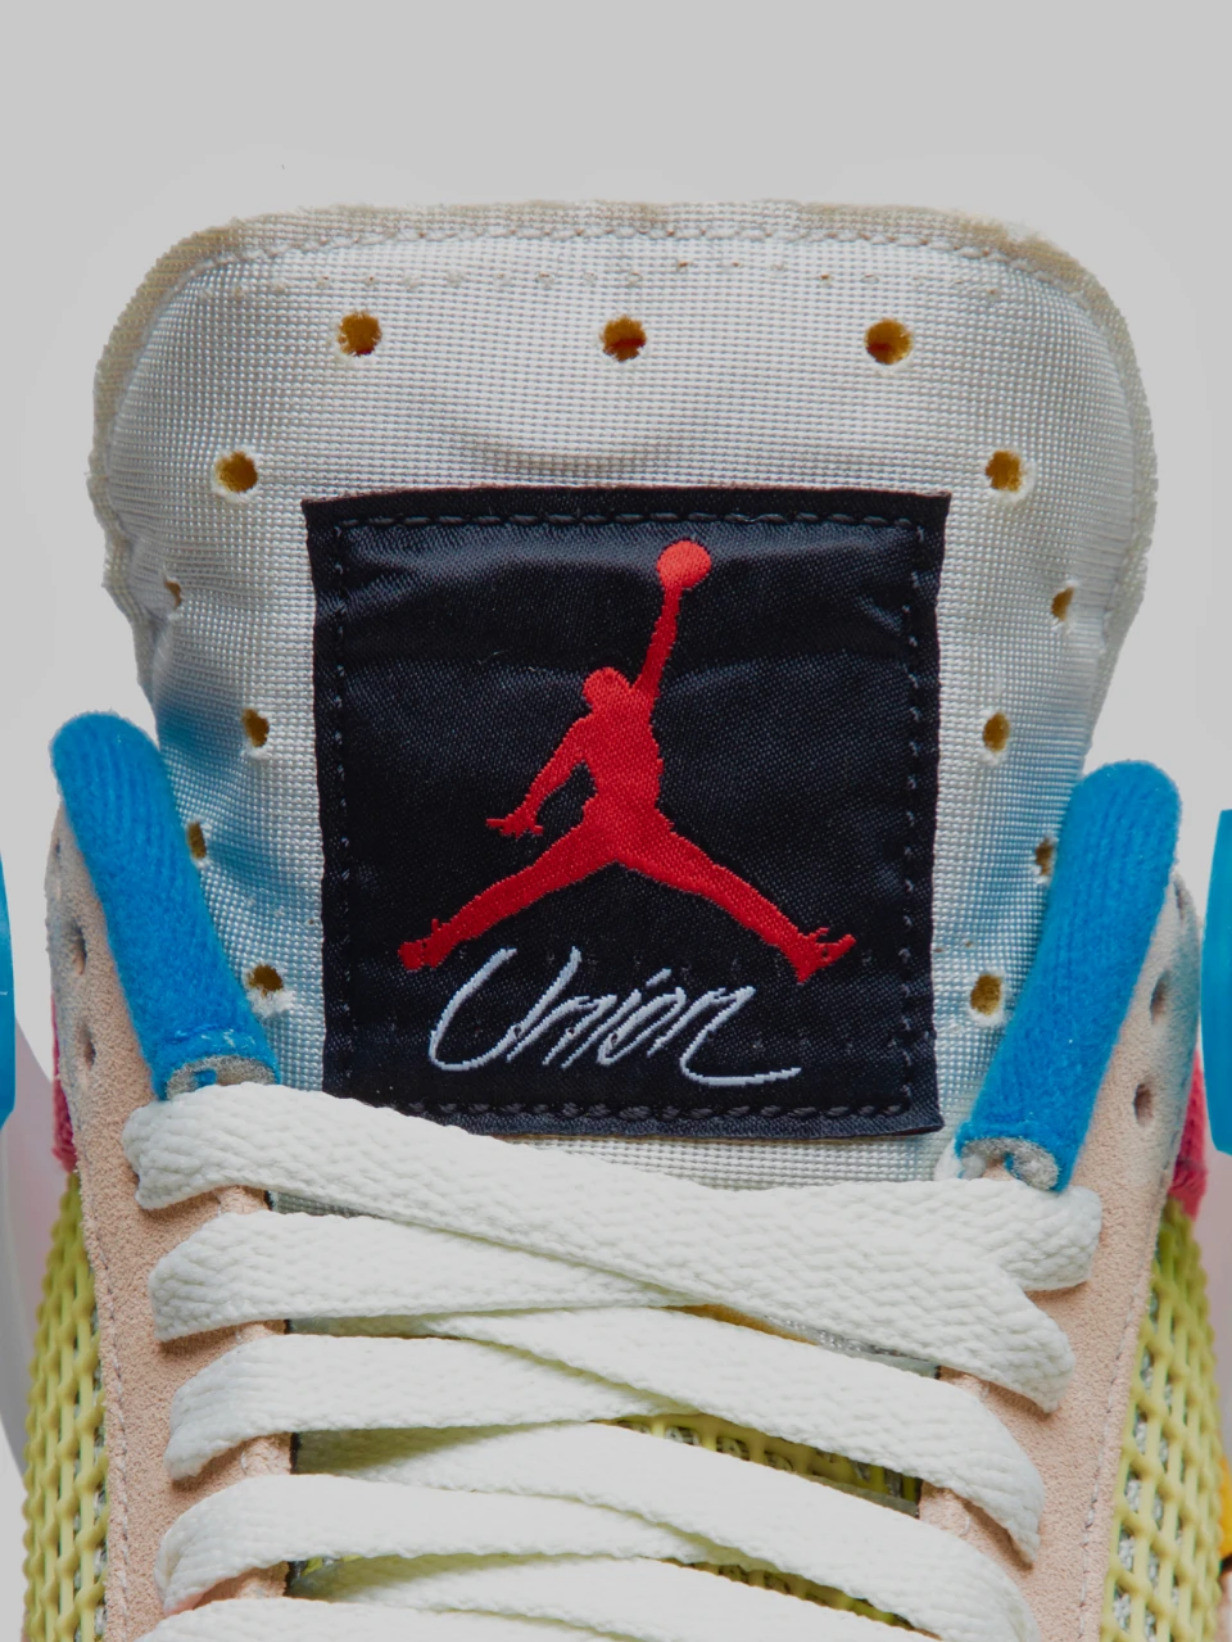 Union LA x Air Jordan 4 Guava Ice togue branding